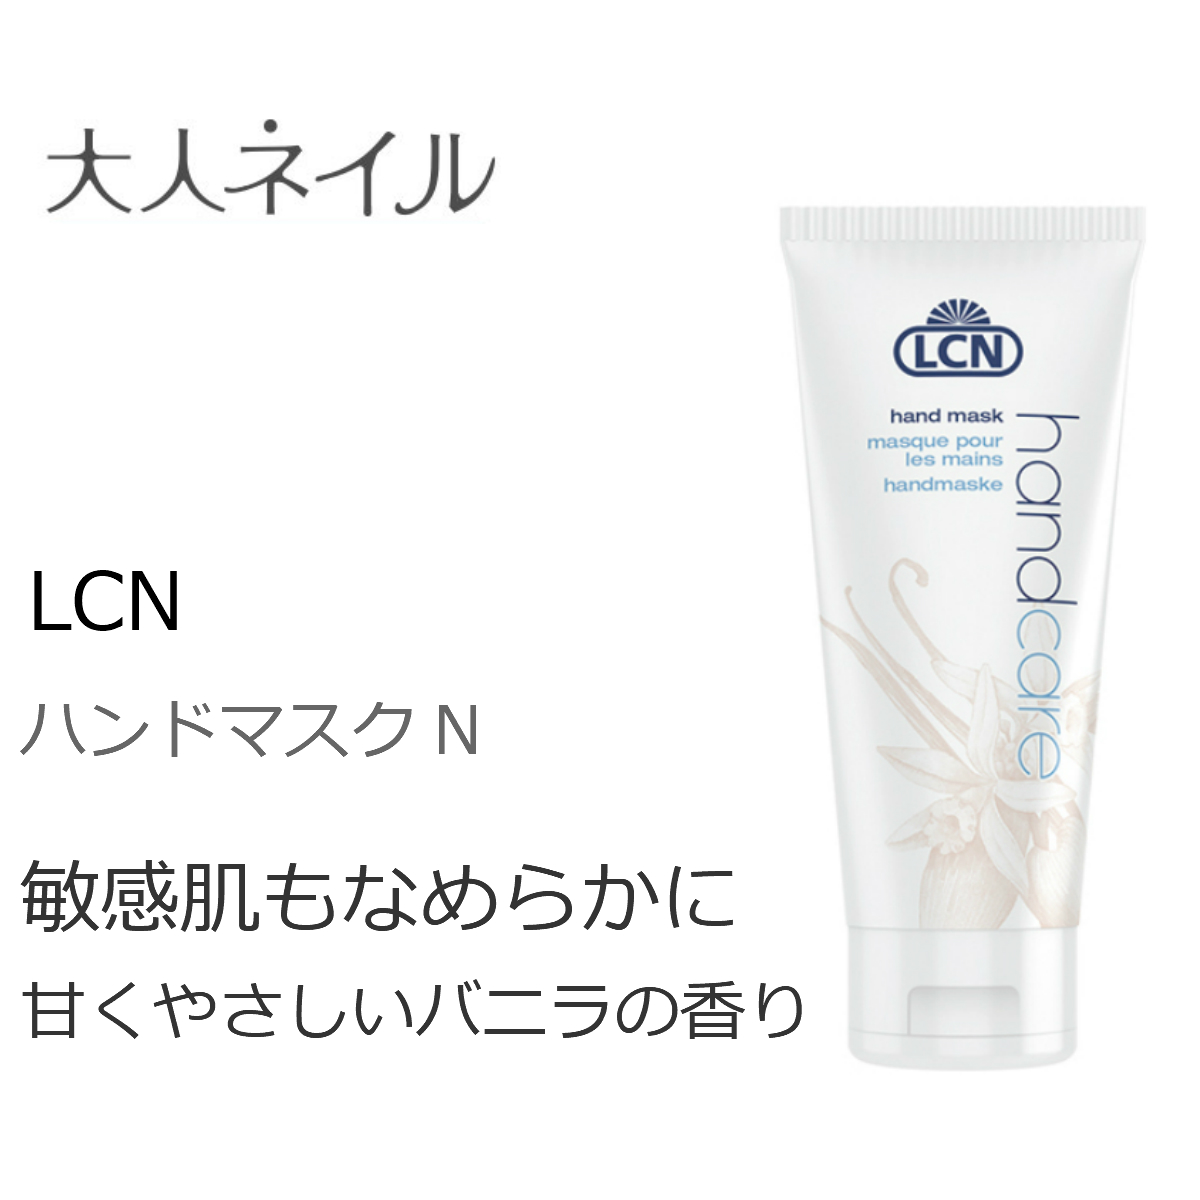 LCN ハンド マスク N  75ml 紫外線 乾燥 保護 うるおい 柔軟性 健やか バニラ 香り